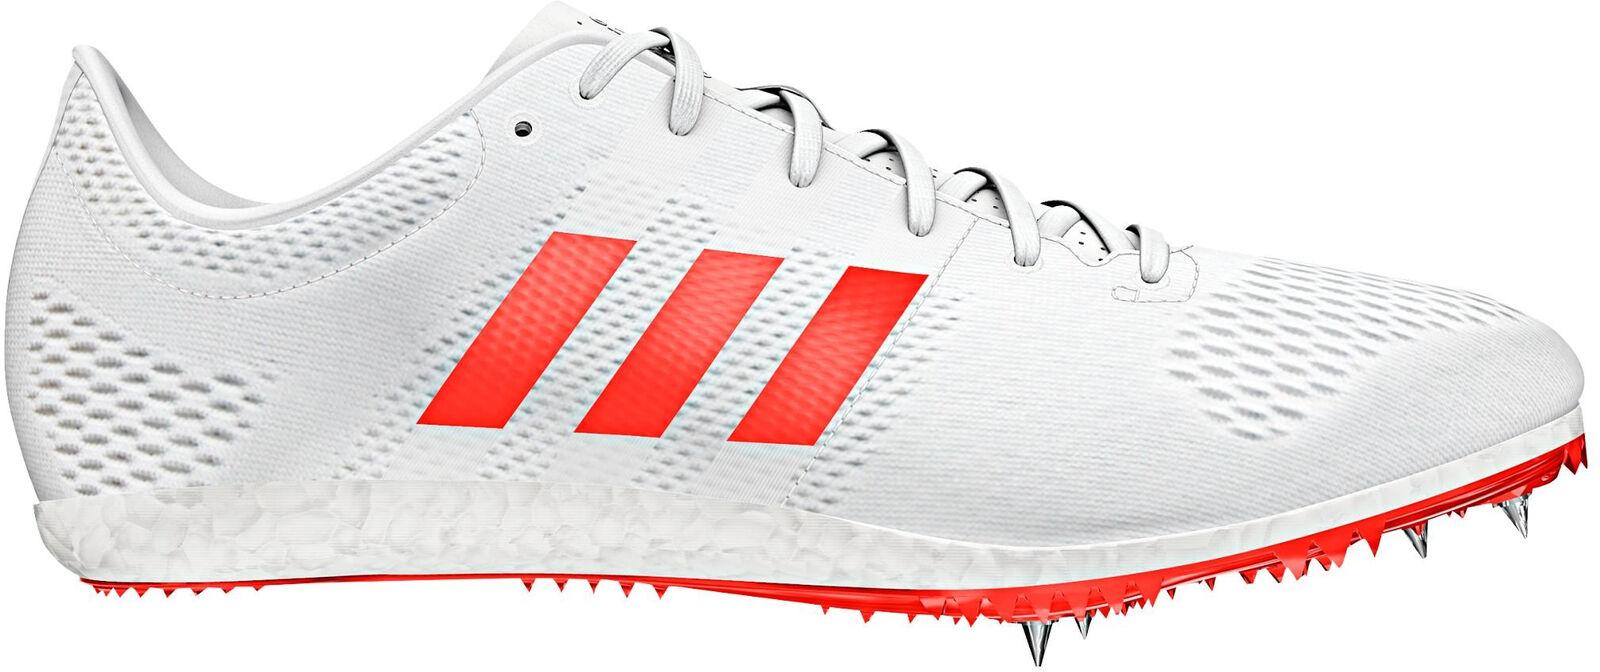 ab1feb4994d21 Adidas Adizero Rio Avanti Boost Spikes - White Running nzdxkj8251-Women